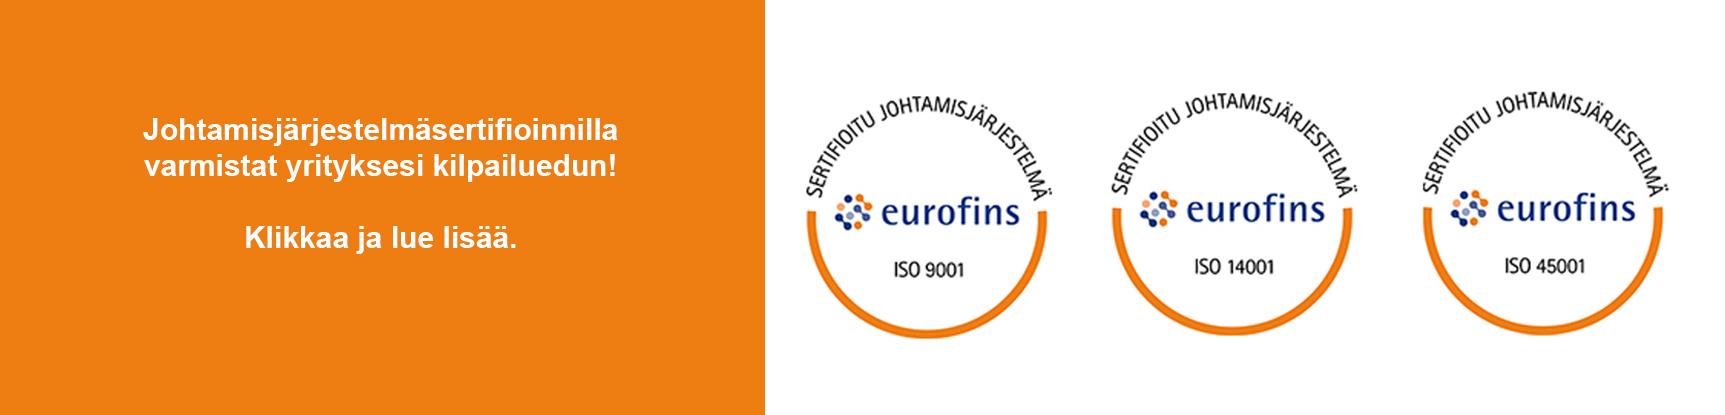 Eurofins Expert Services